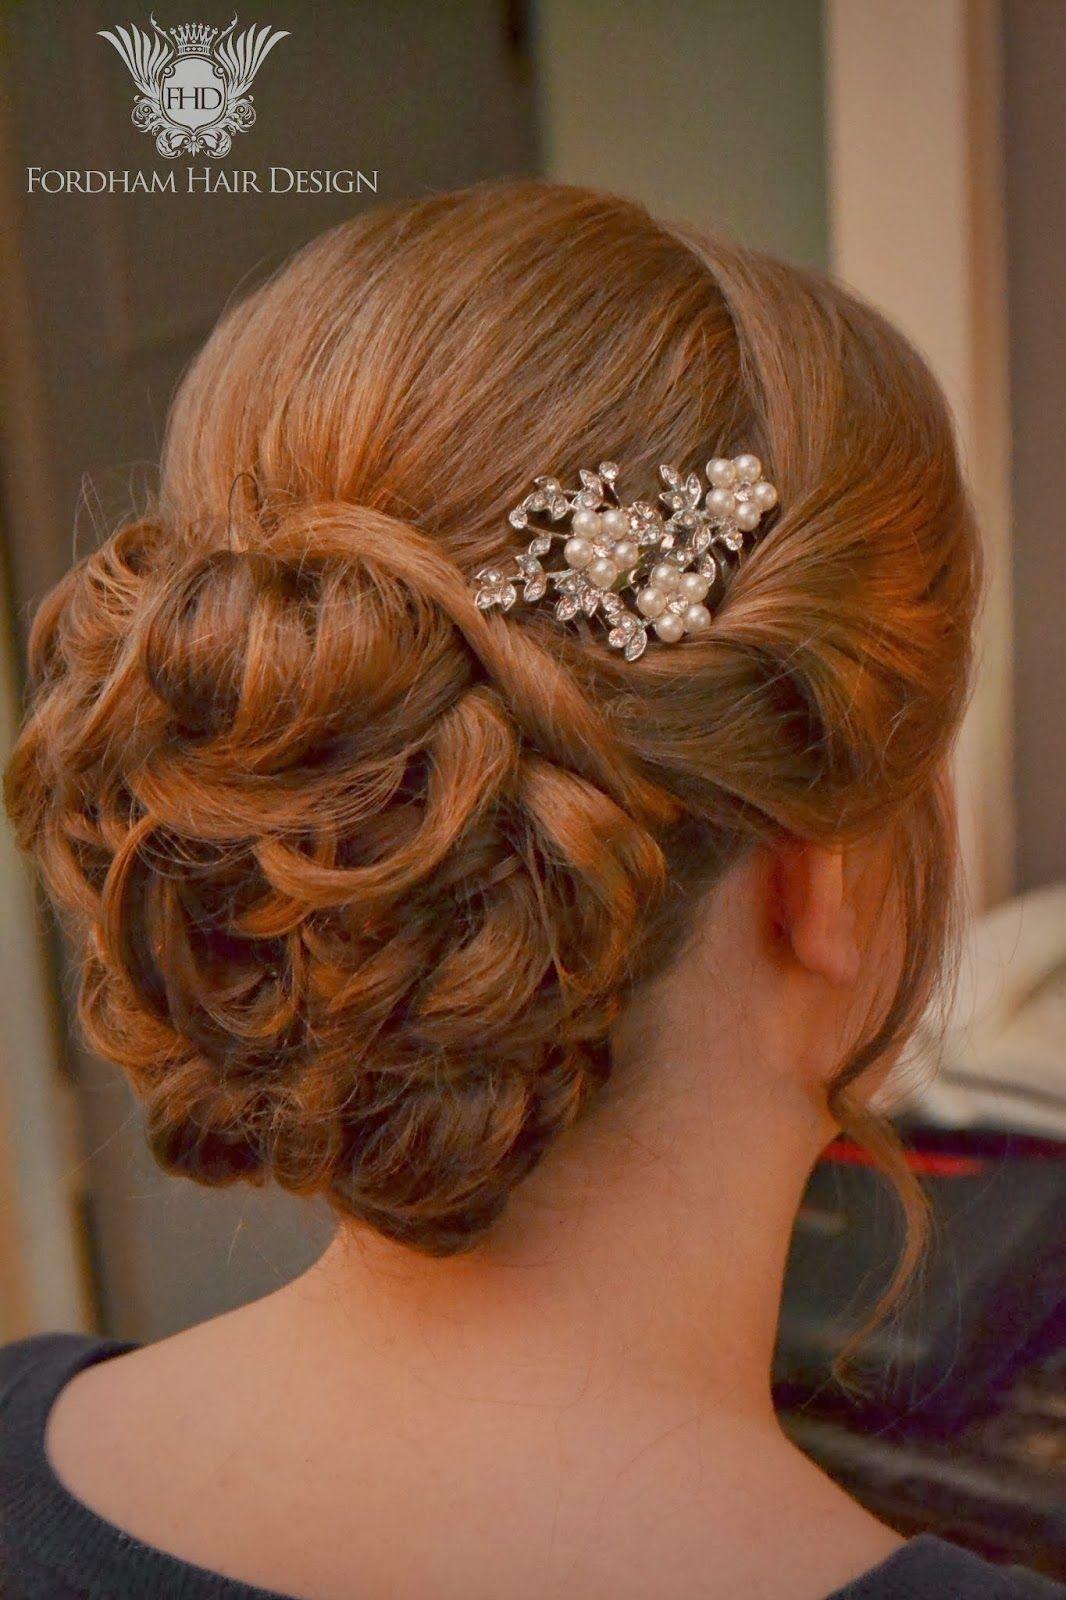 Vintage updo wedding hairstyles hairstyle names a mawwiage vintage updo wedding hairstyles hairstyle names pmusecretfo Images